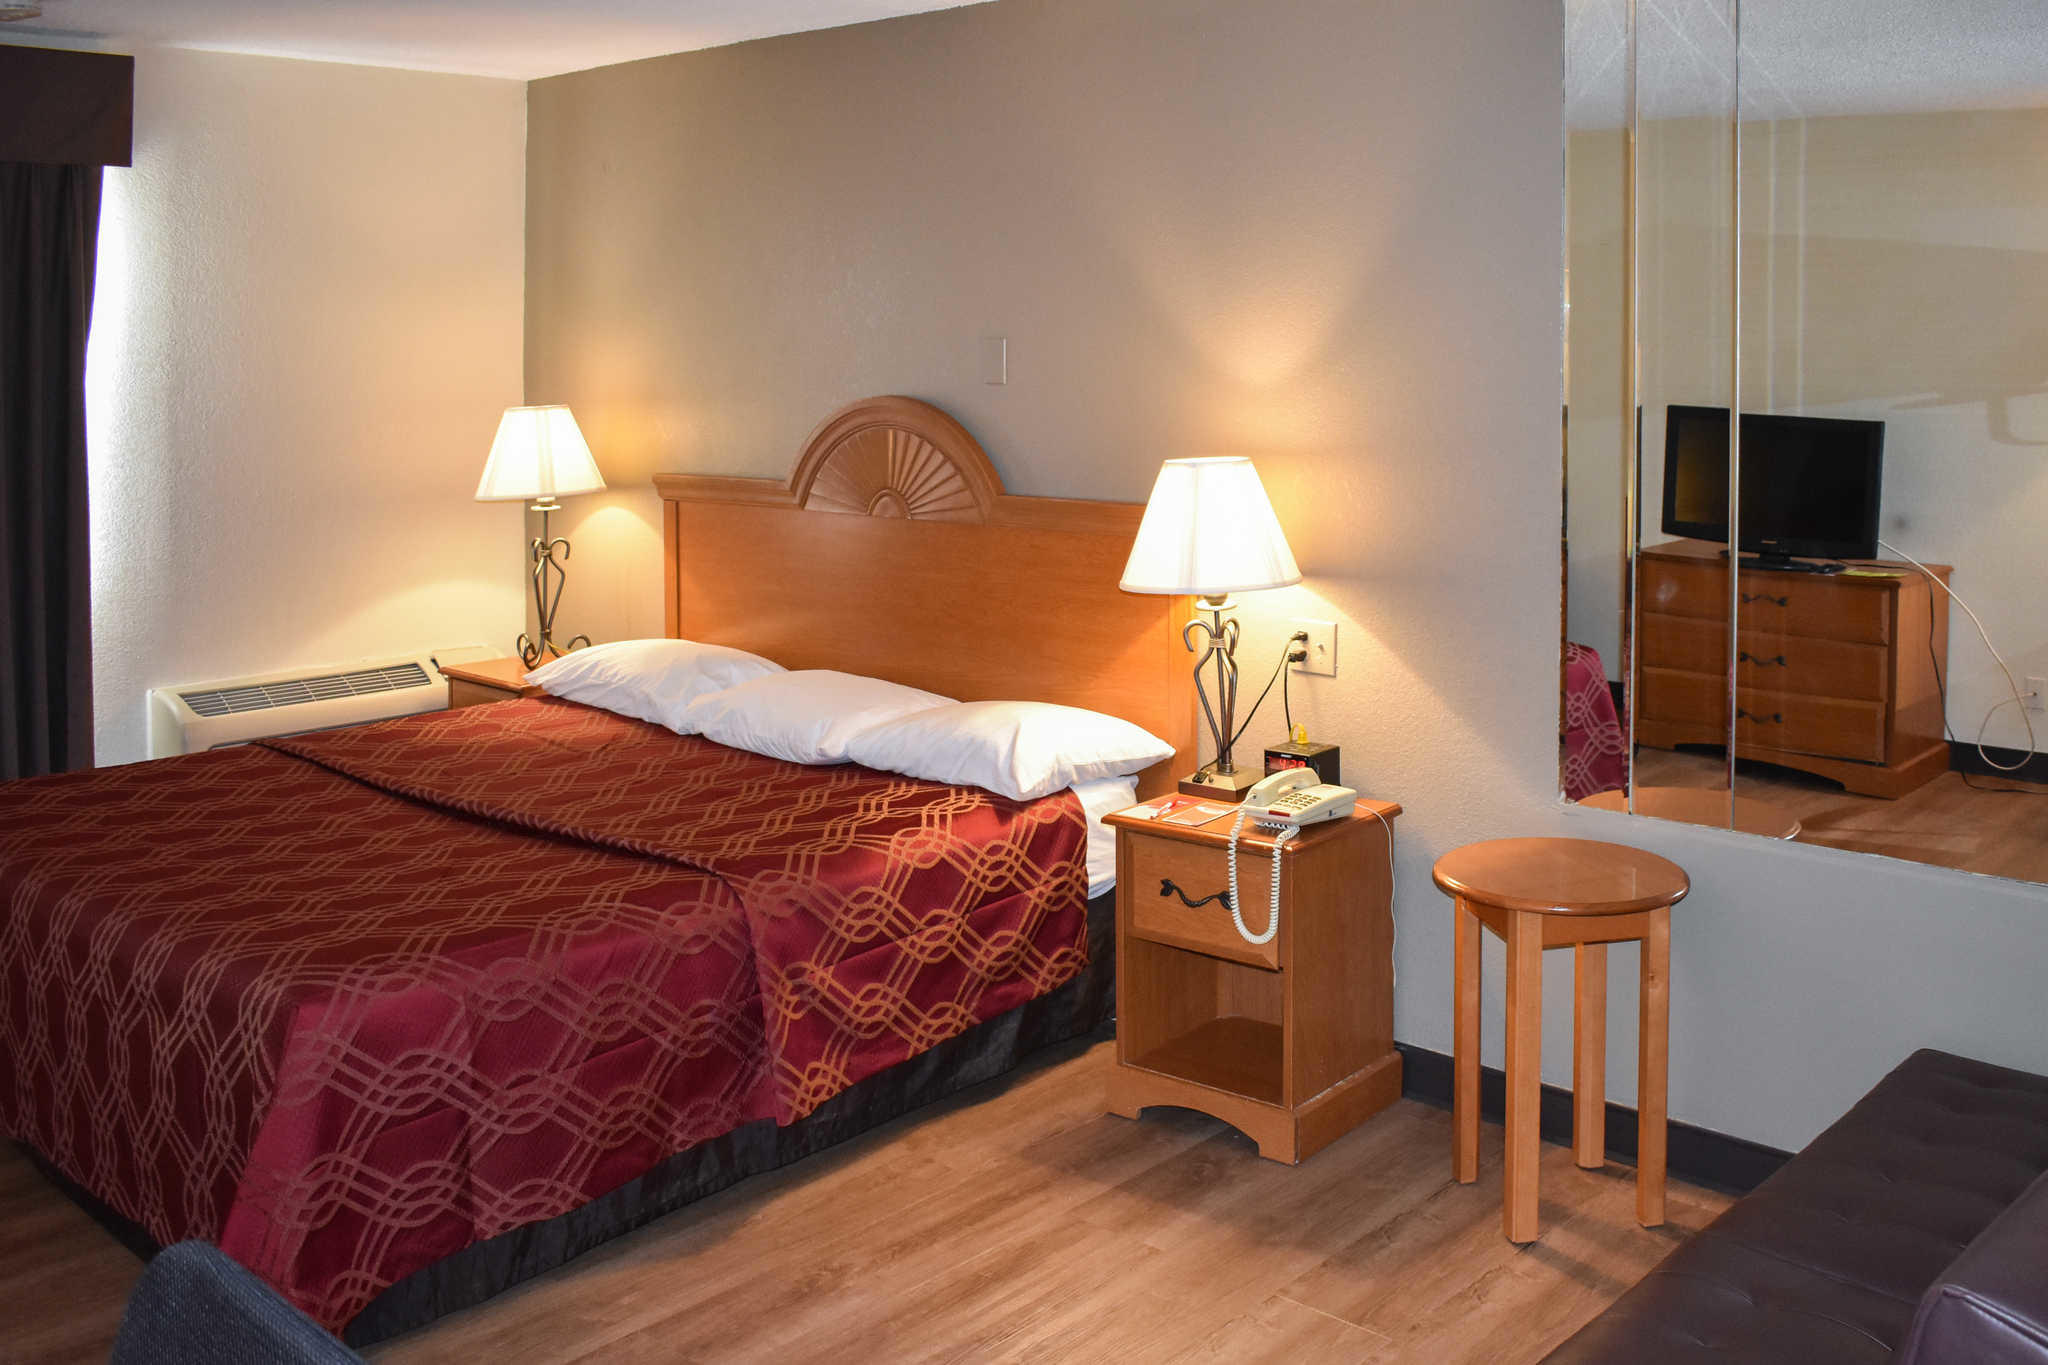 Econo Lodge Inn & Suites - Closed image 15